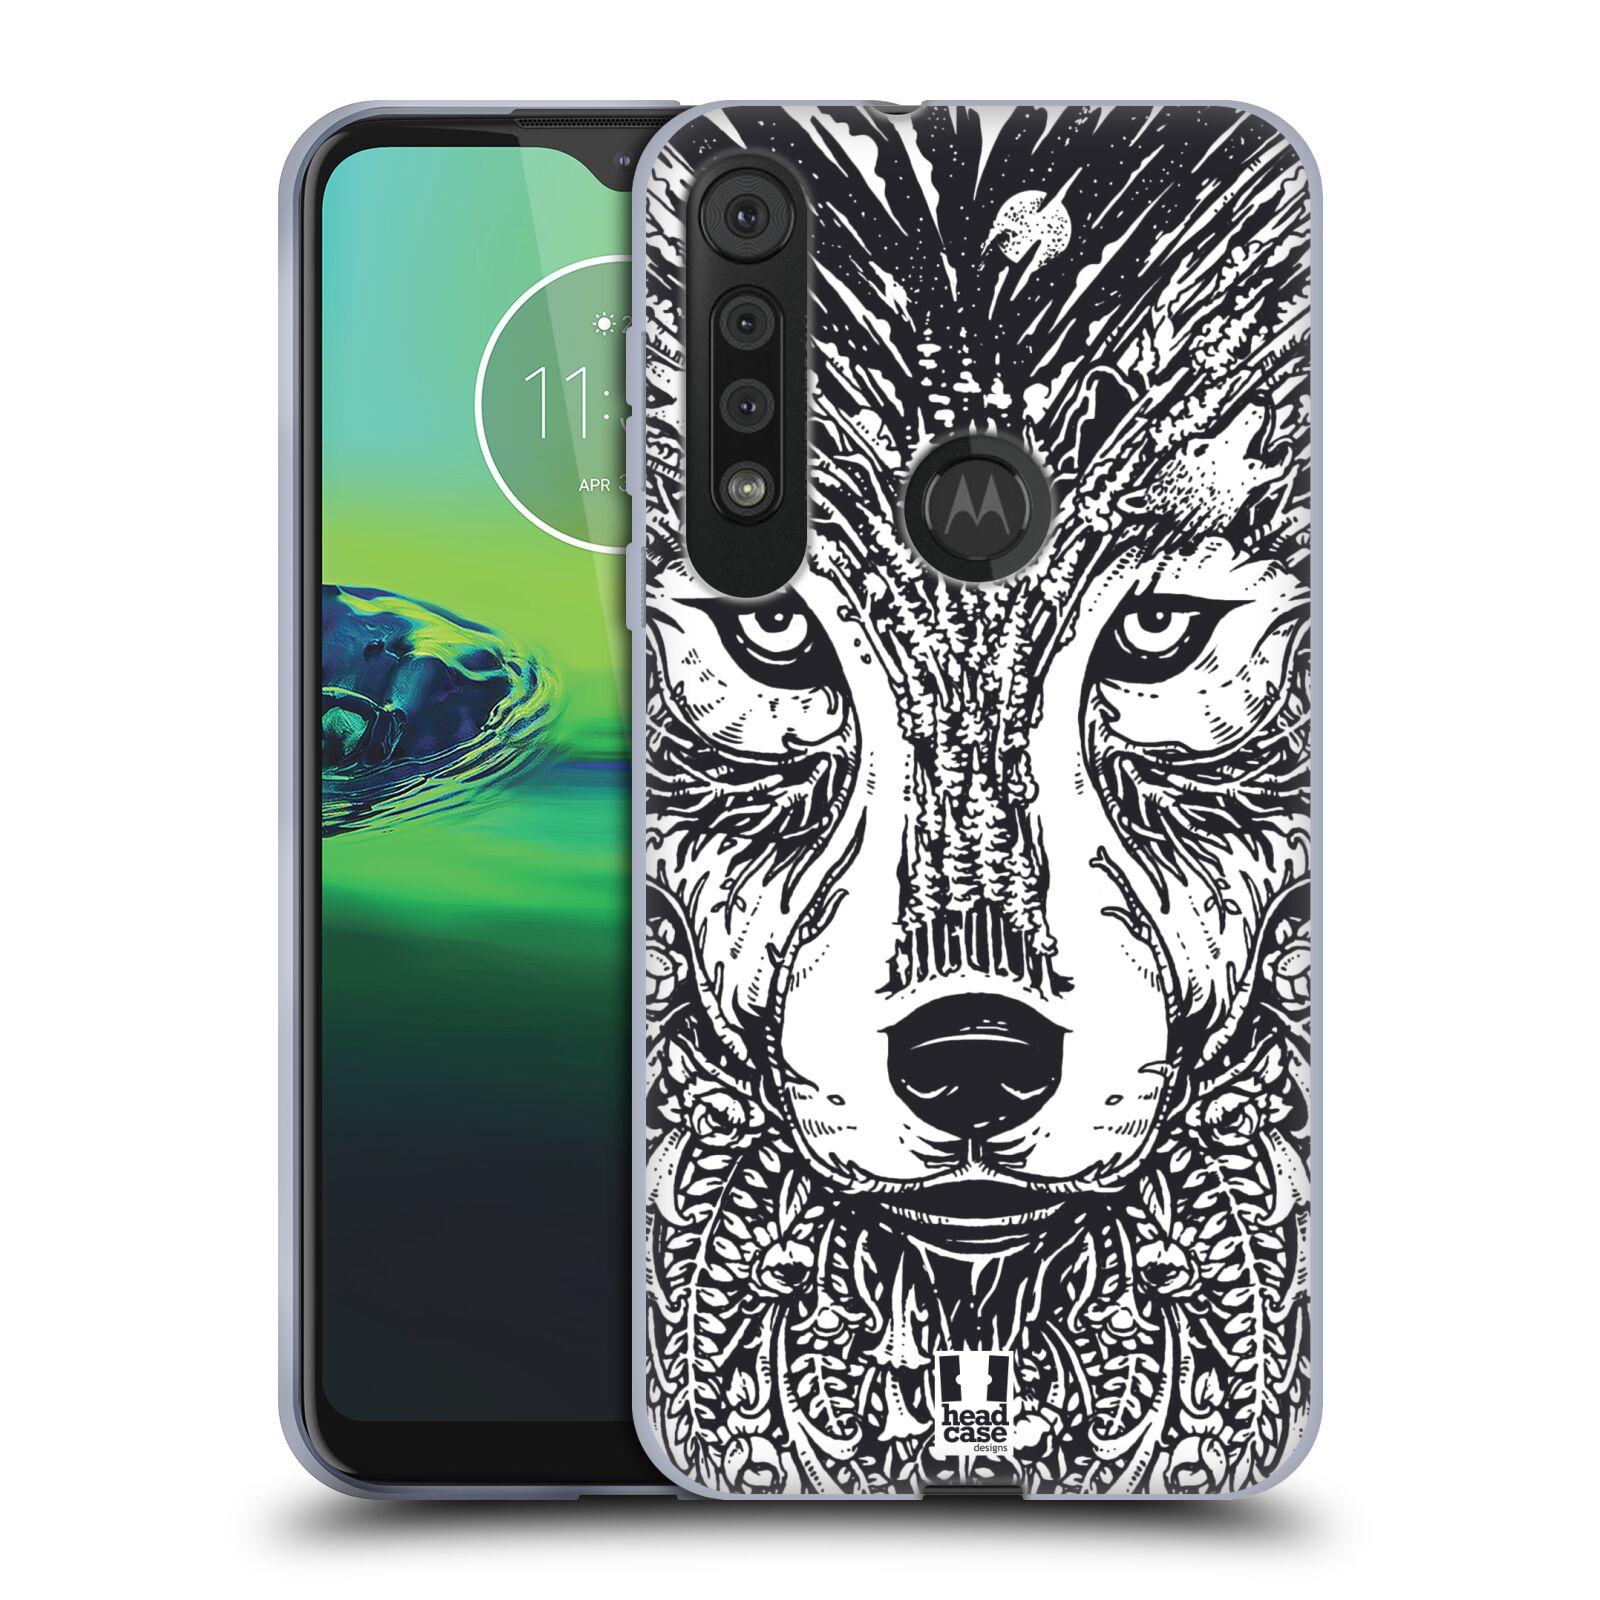 Silikonové pouzdro na mobil Motorola One Macro - Head Case - DOODLE TVÁŘ VLK